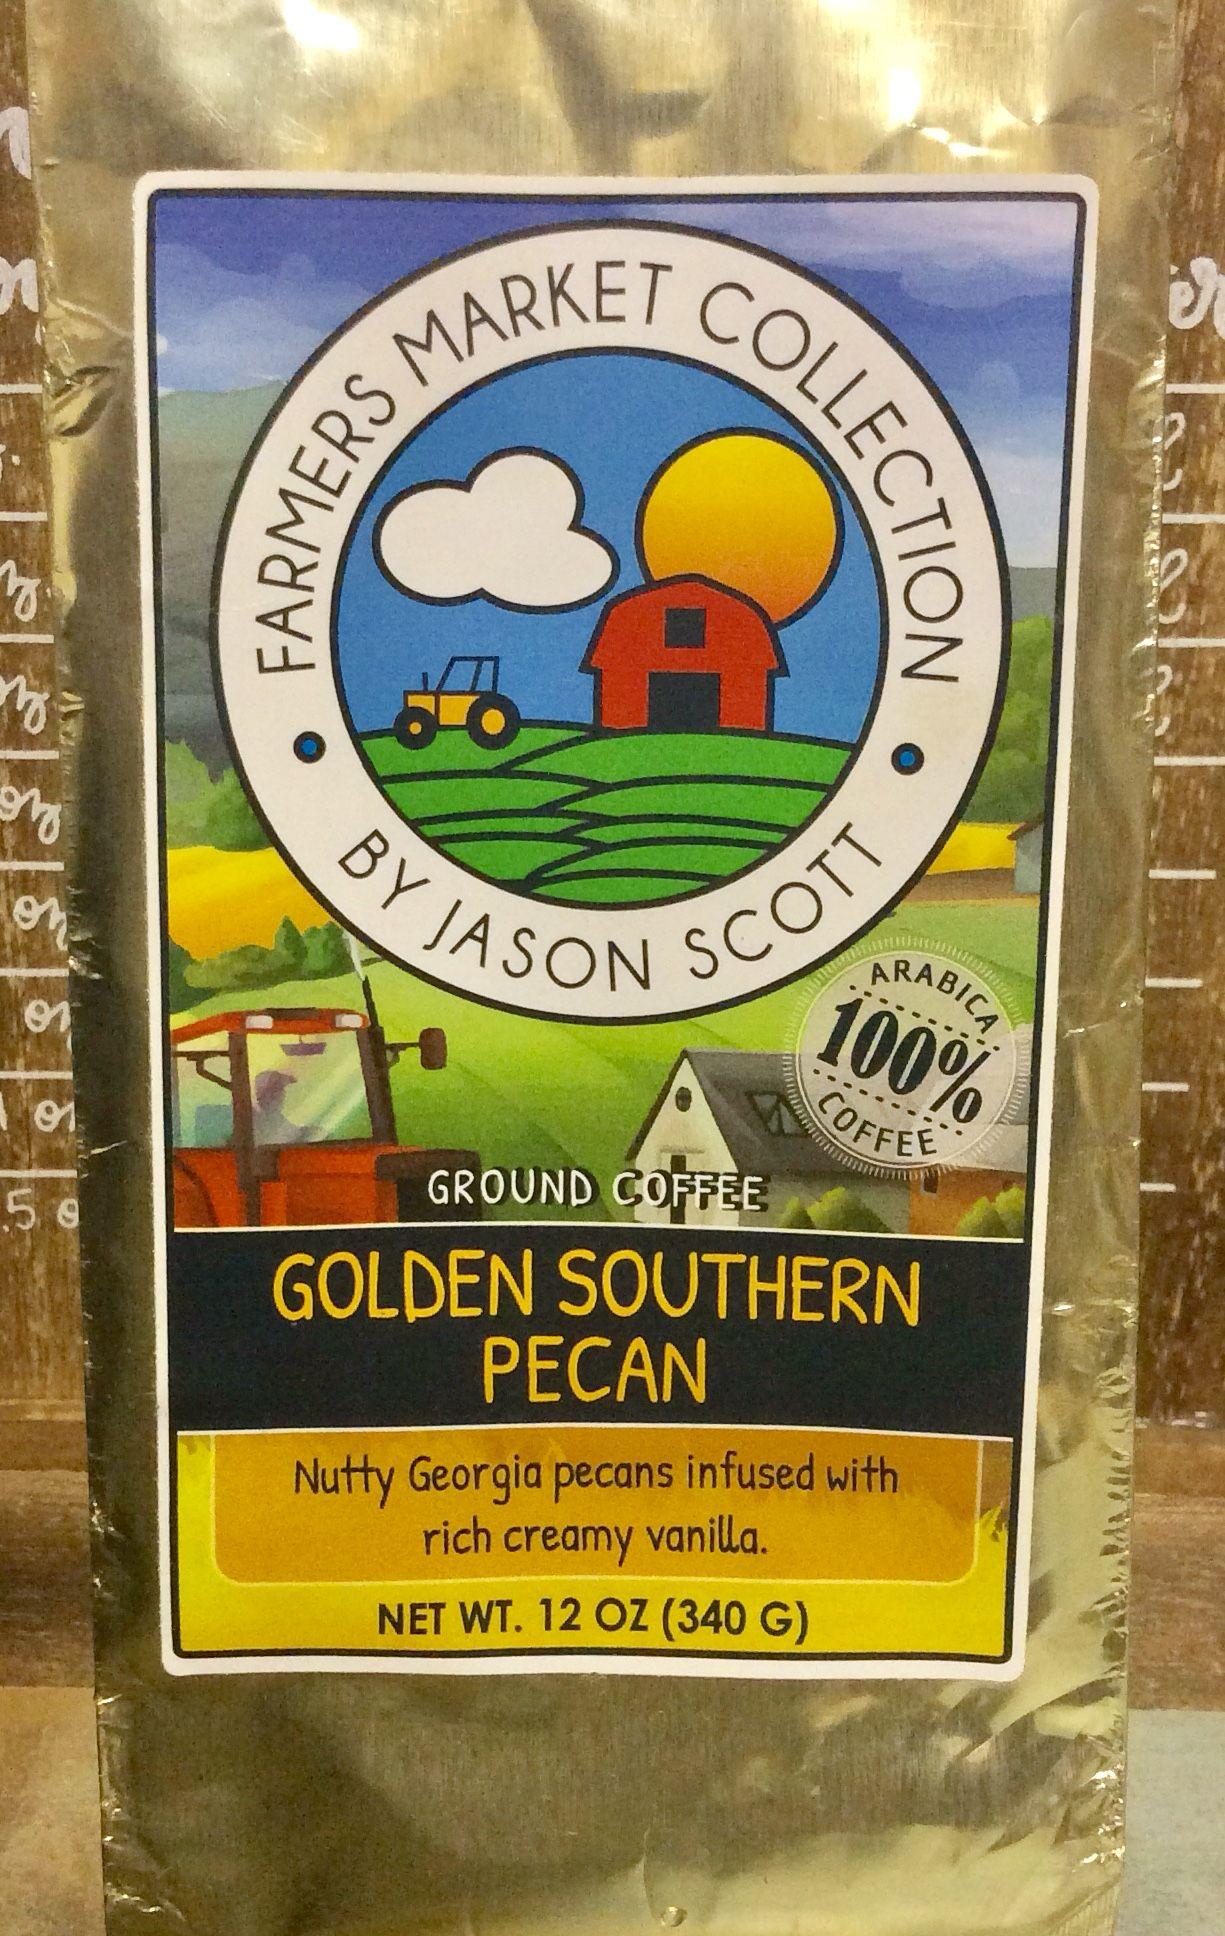 Farmer's Market Collection By Jason Scott Golden Southern